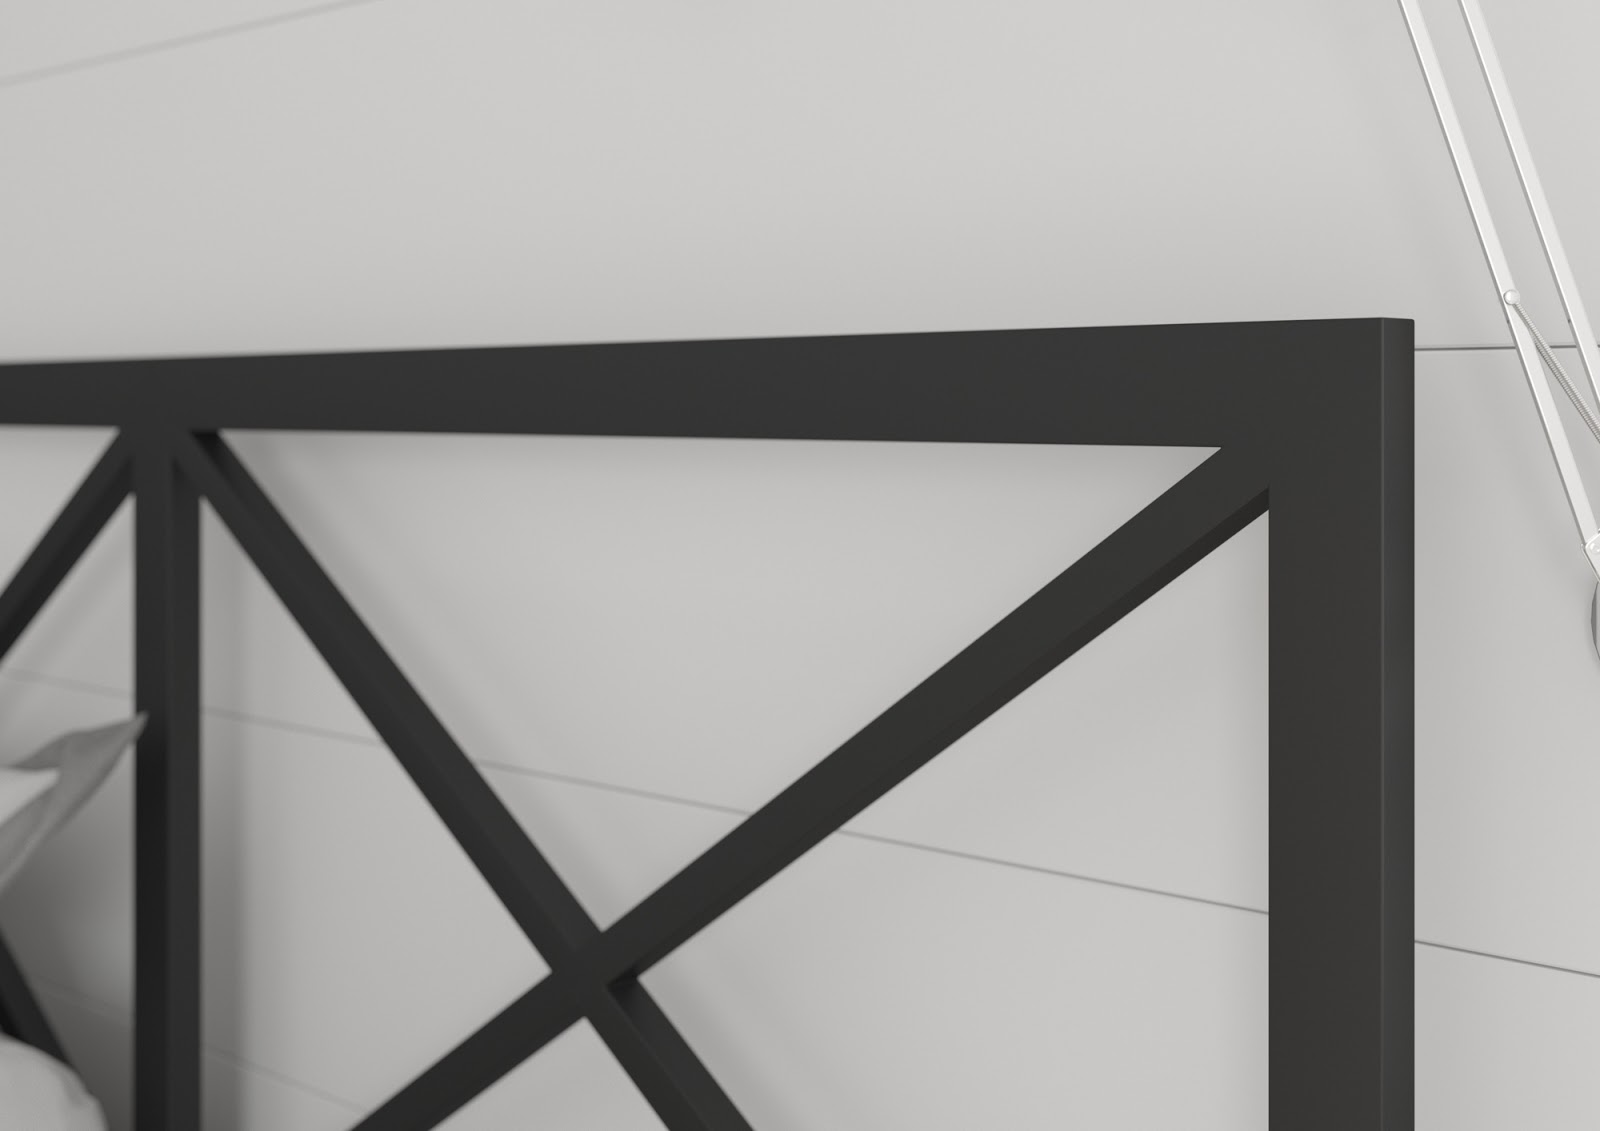 Łóżko metalowe wzór 38 (120-160 cm)